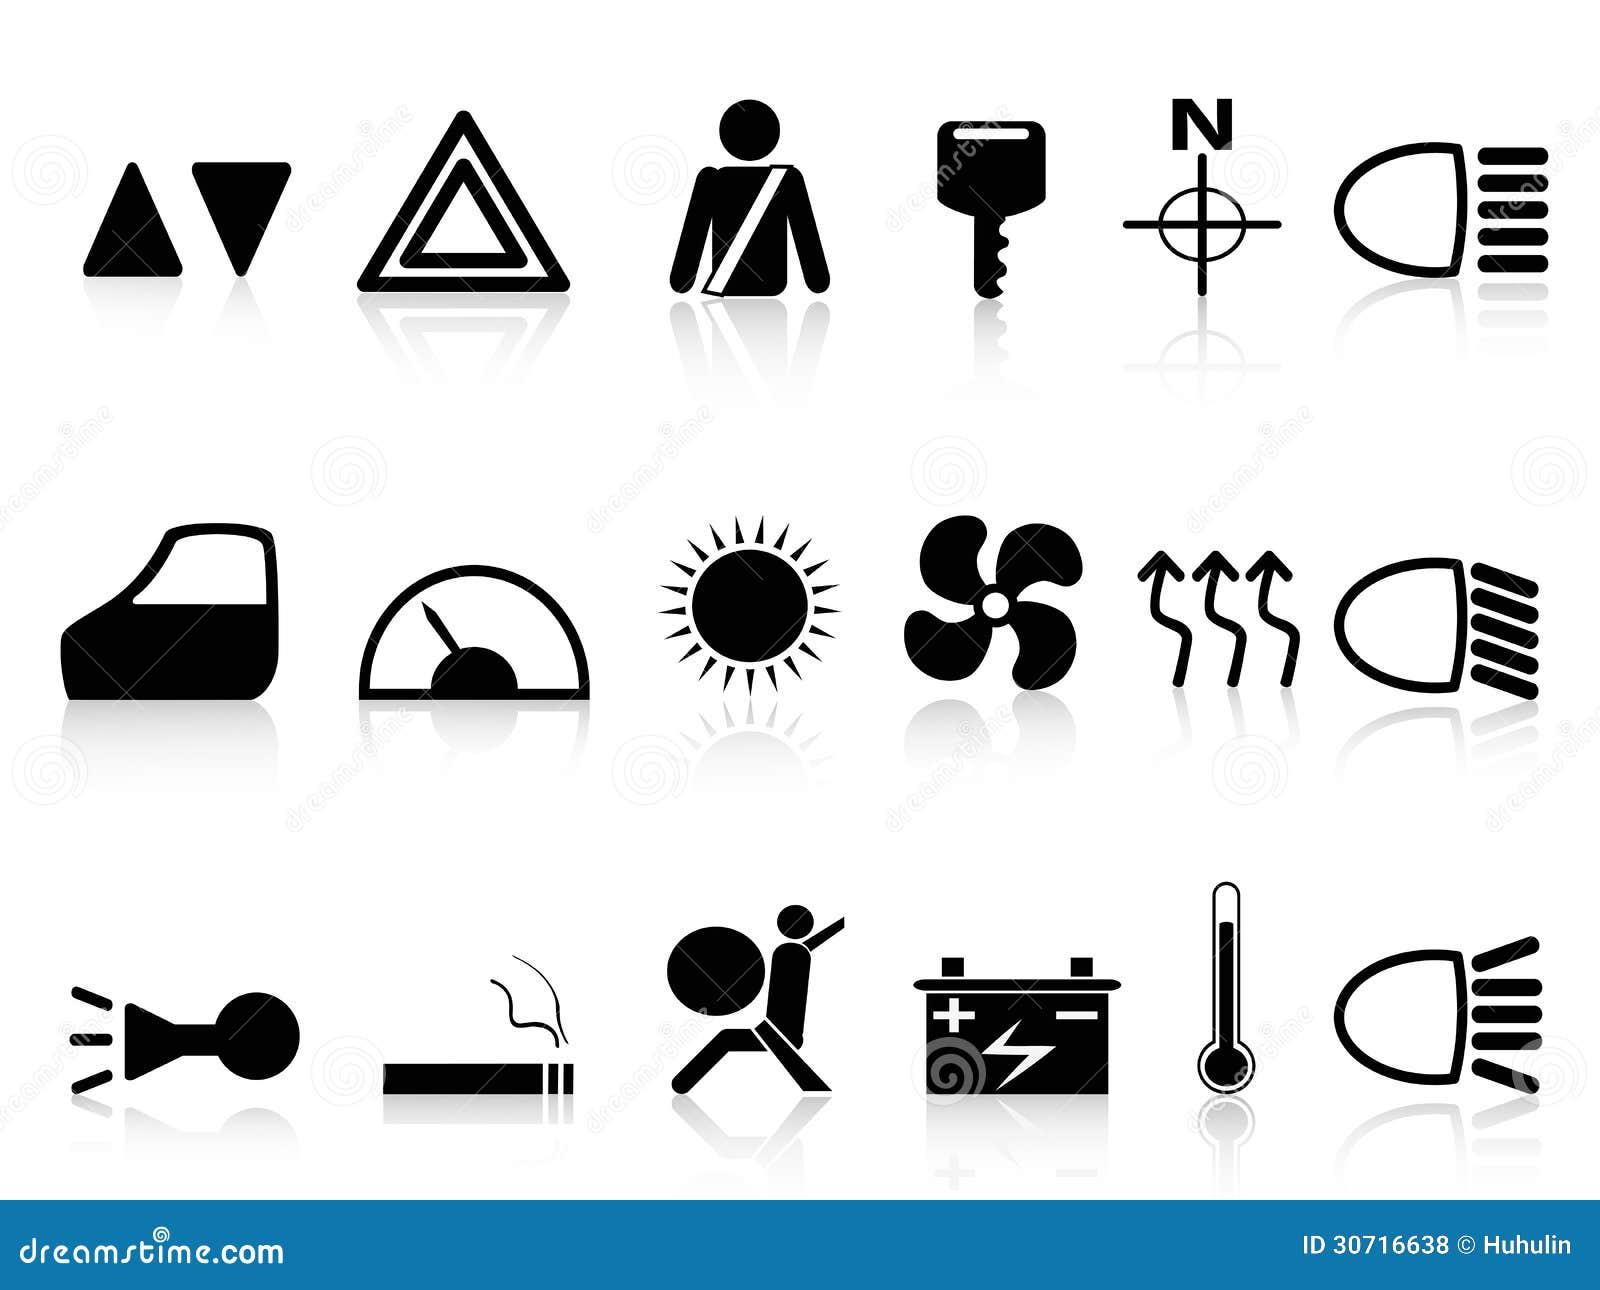 Car Dashboard Icons Stock Vector Illustration Of Internet - Car image sign of dashboardcar dashboard icons stock images royaltyfree imagesvectors